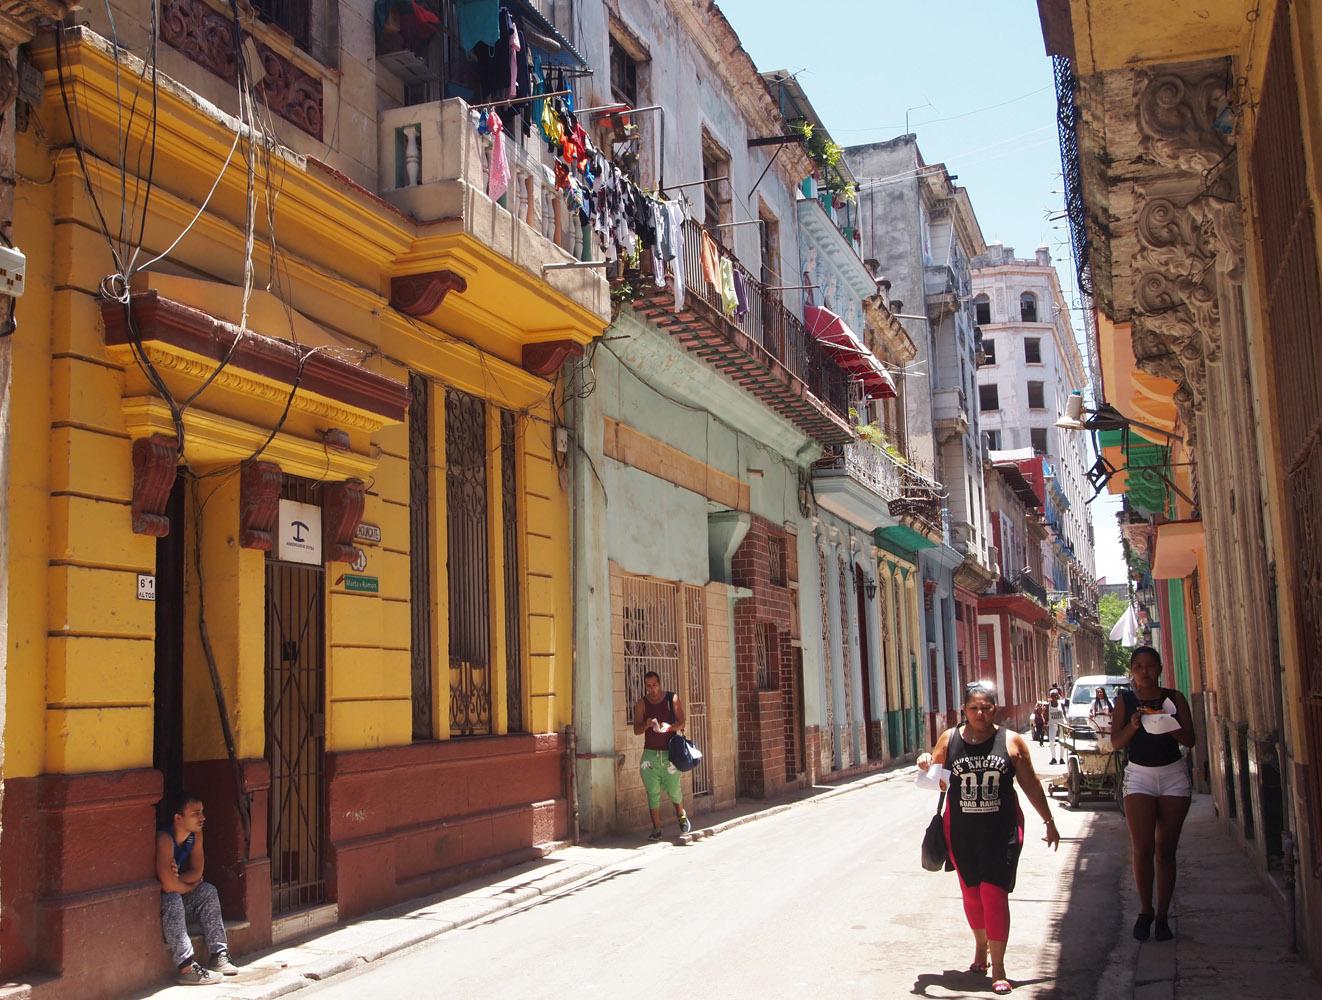 Cuba-Havana-Vieja-Street-Local-People.jpg